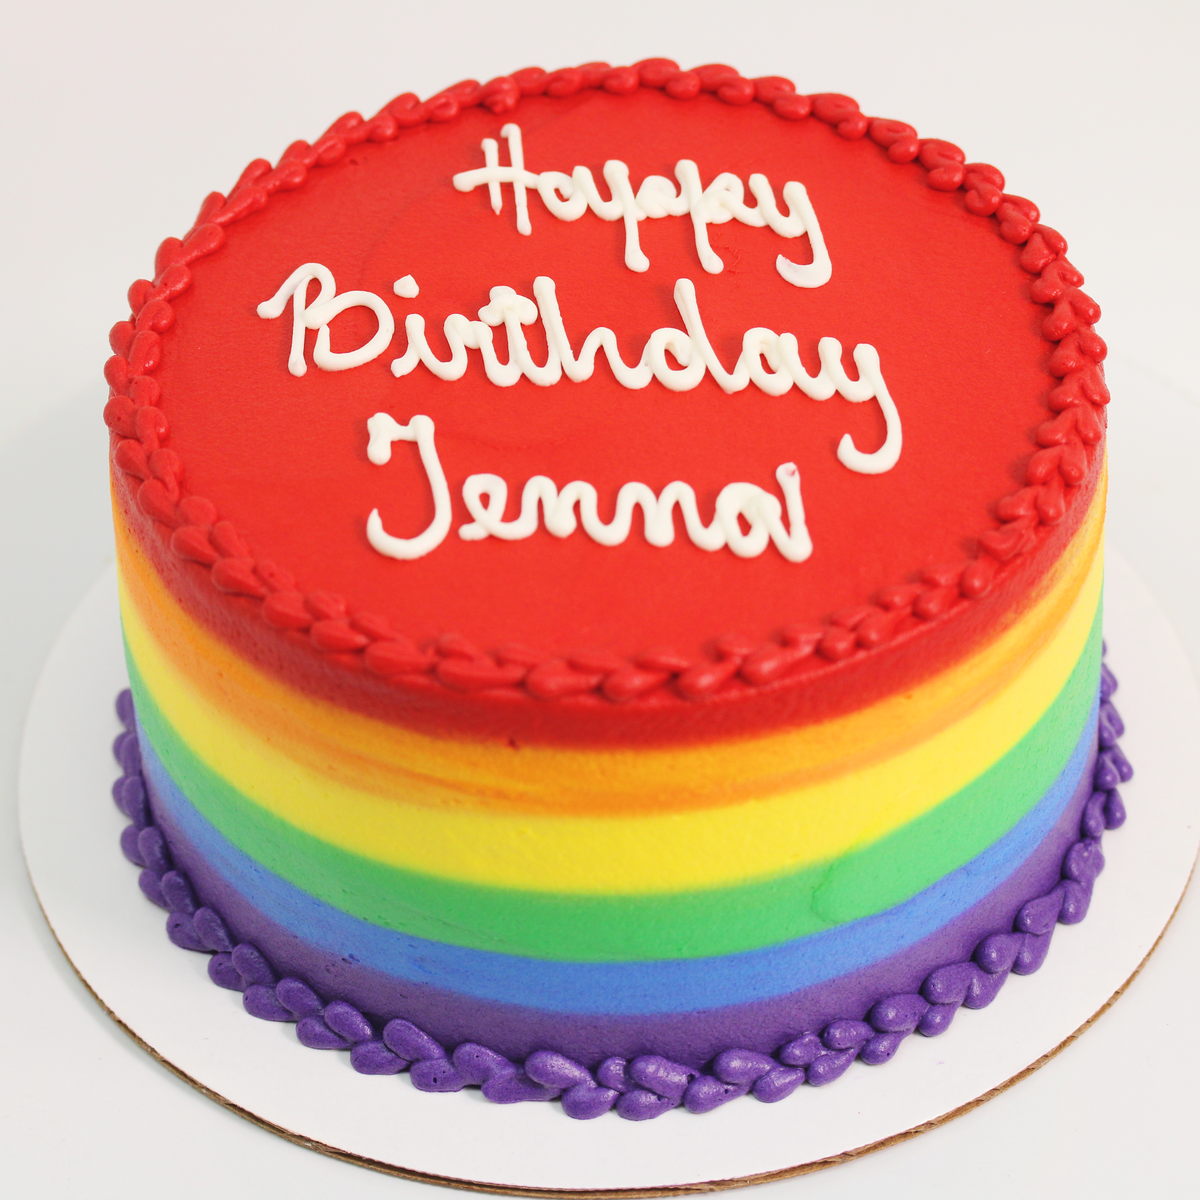 Sensational By The Way Bakery Funny Birthday Cards Online Necthendildamsfinfo